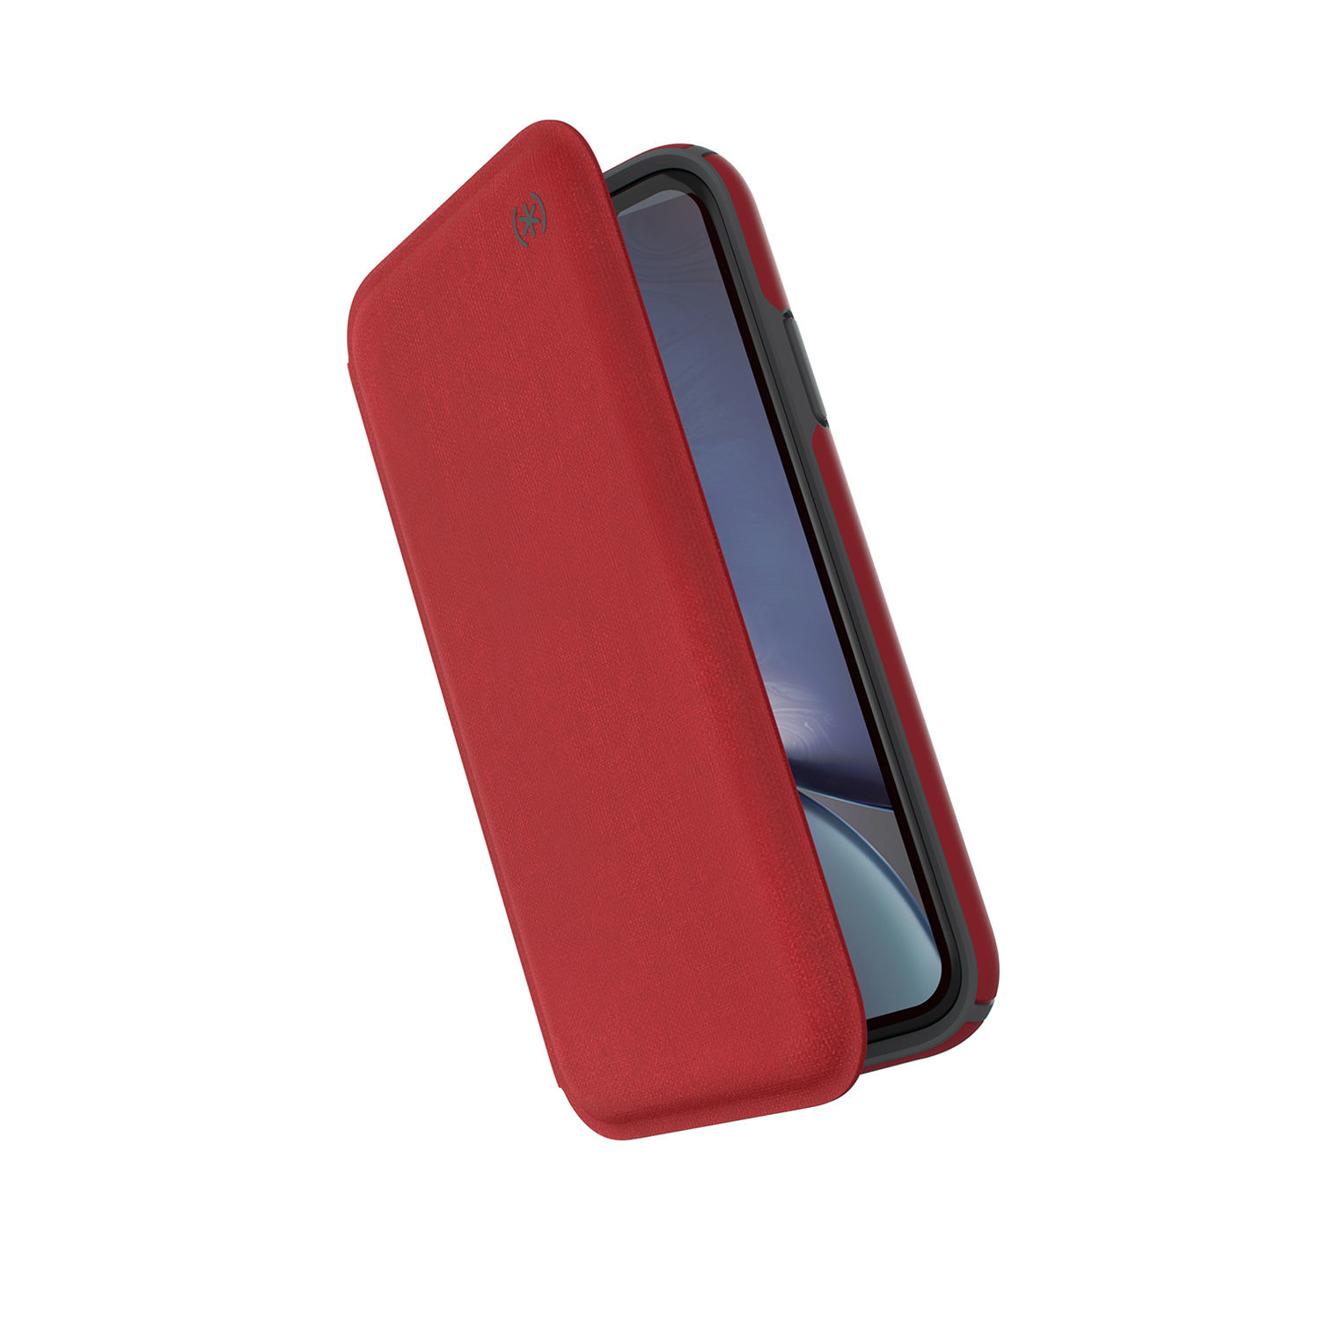 Speck Presidio Folio case for iPhone XR